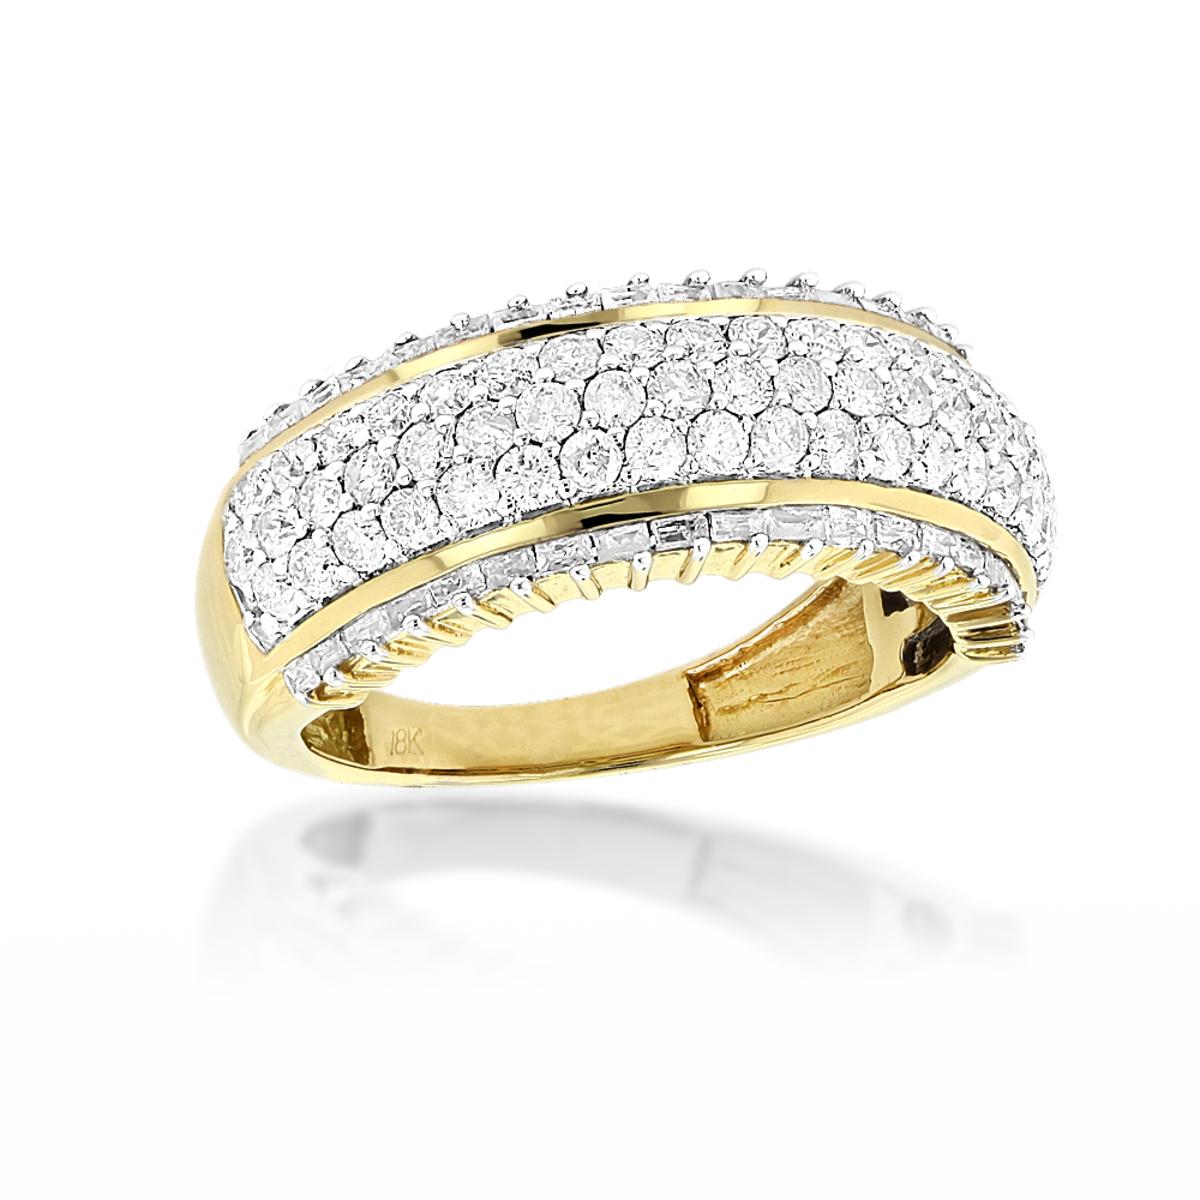 18K Gold Designer Diamond Band Round Baguette 2.34ct